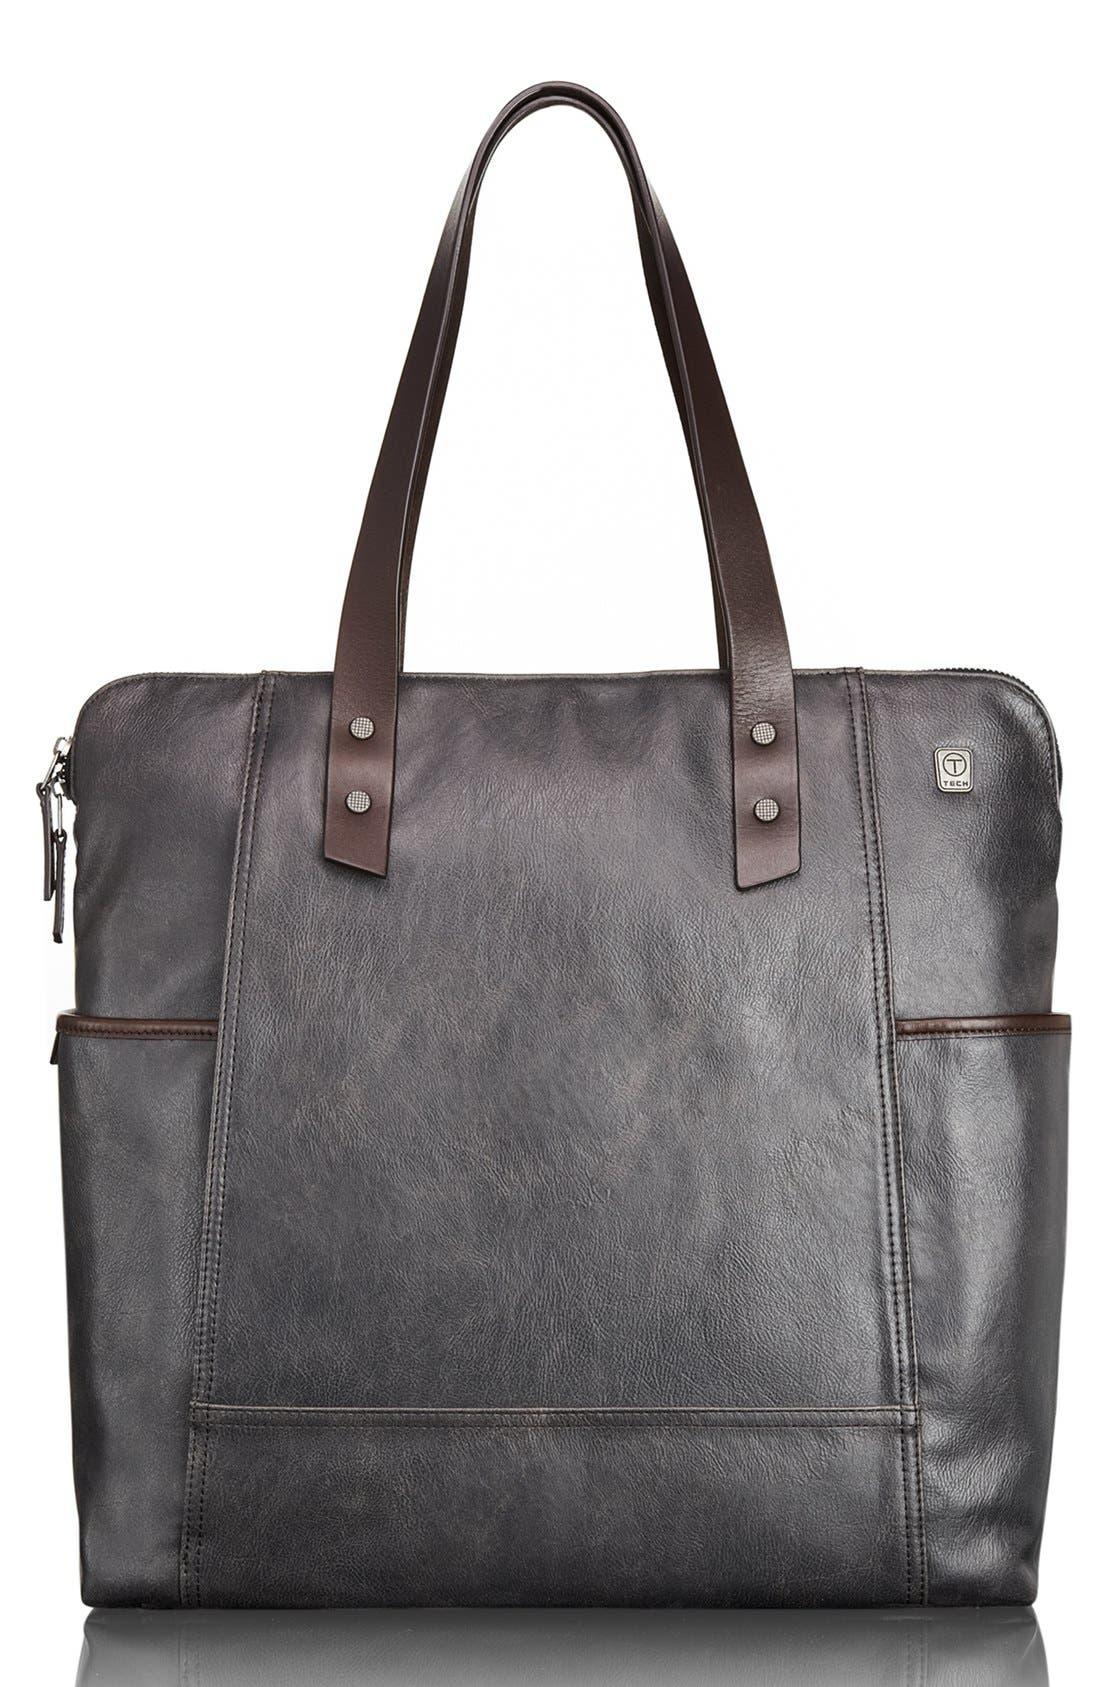 Main Image - T-Tech by Tumi 'Forge - Sudbury' Tote Bag